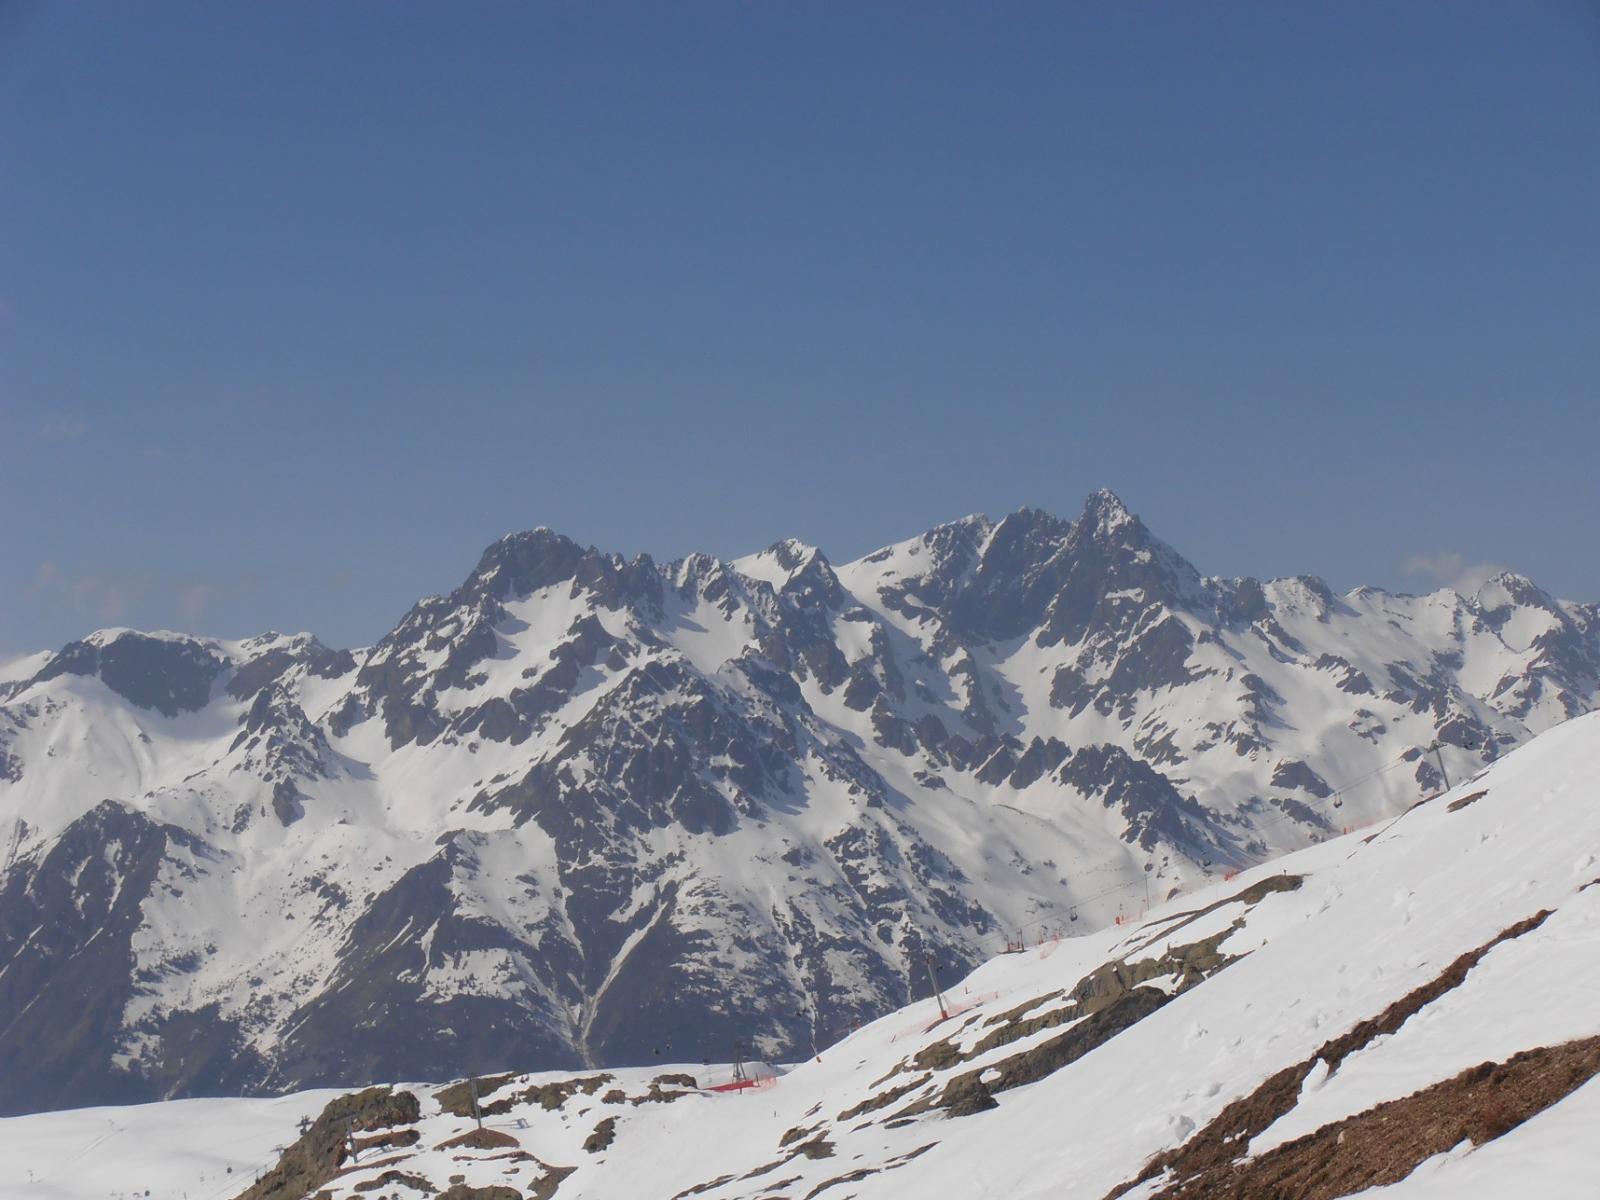 05 - Massif de Belledonne